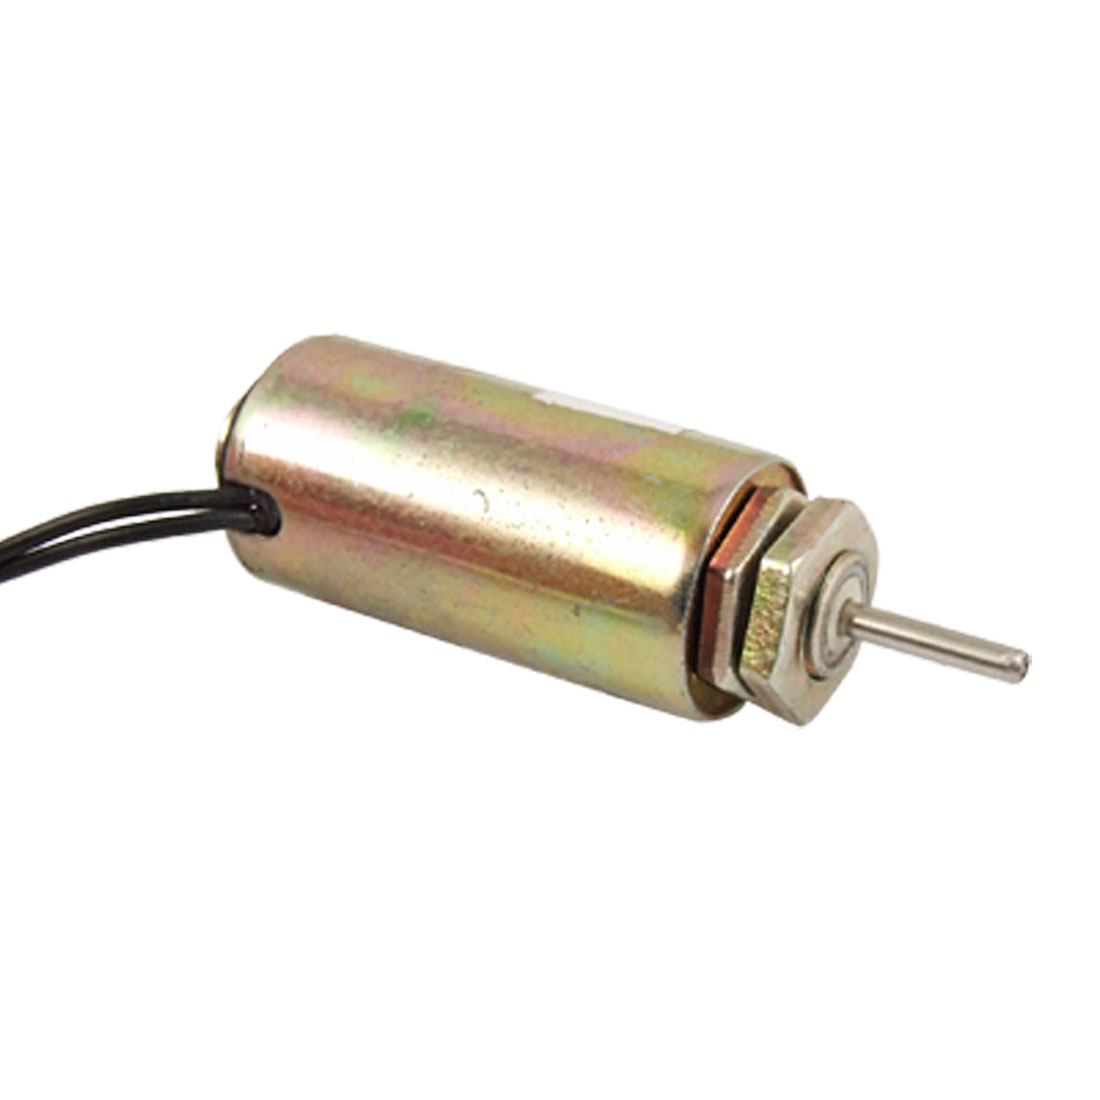 DC 12V 0.4A 2.5mm Stroke Push Type Tubular Solenoid Coil